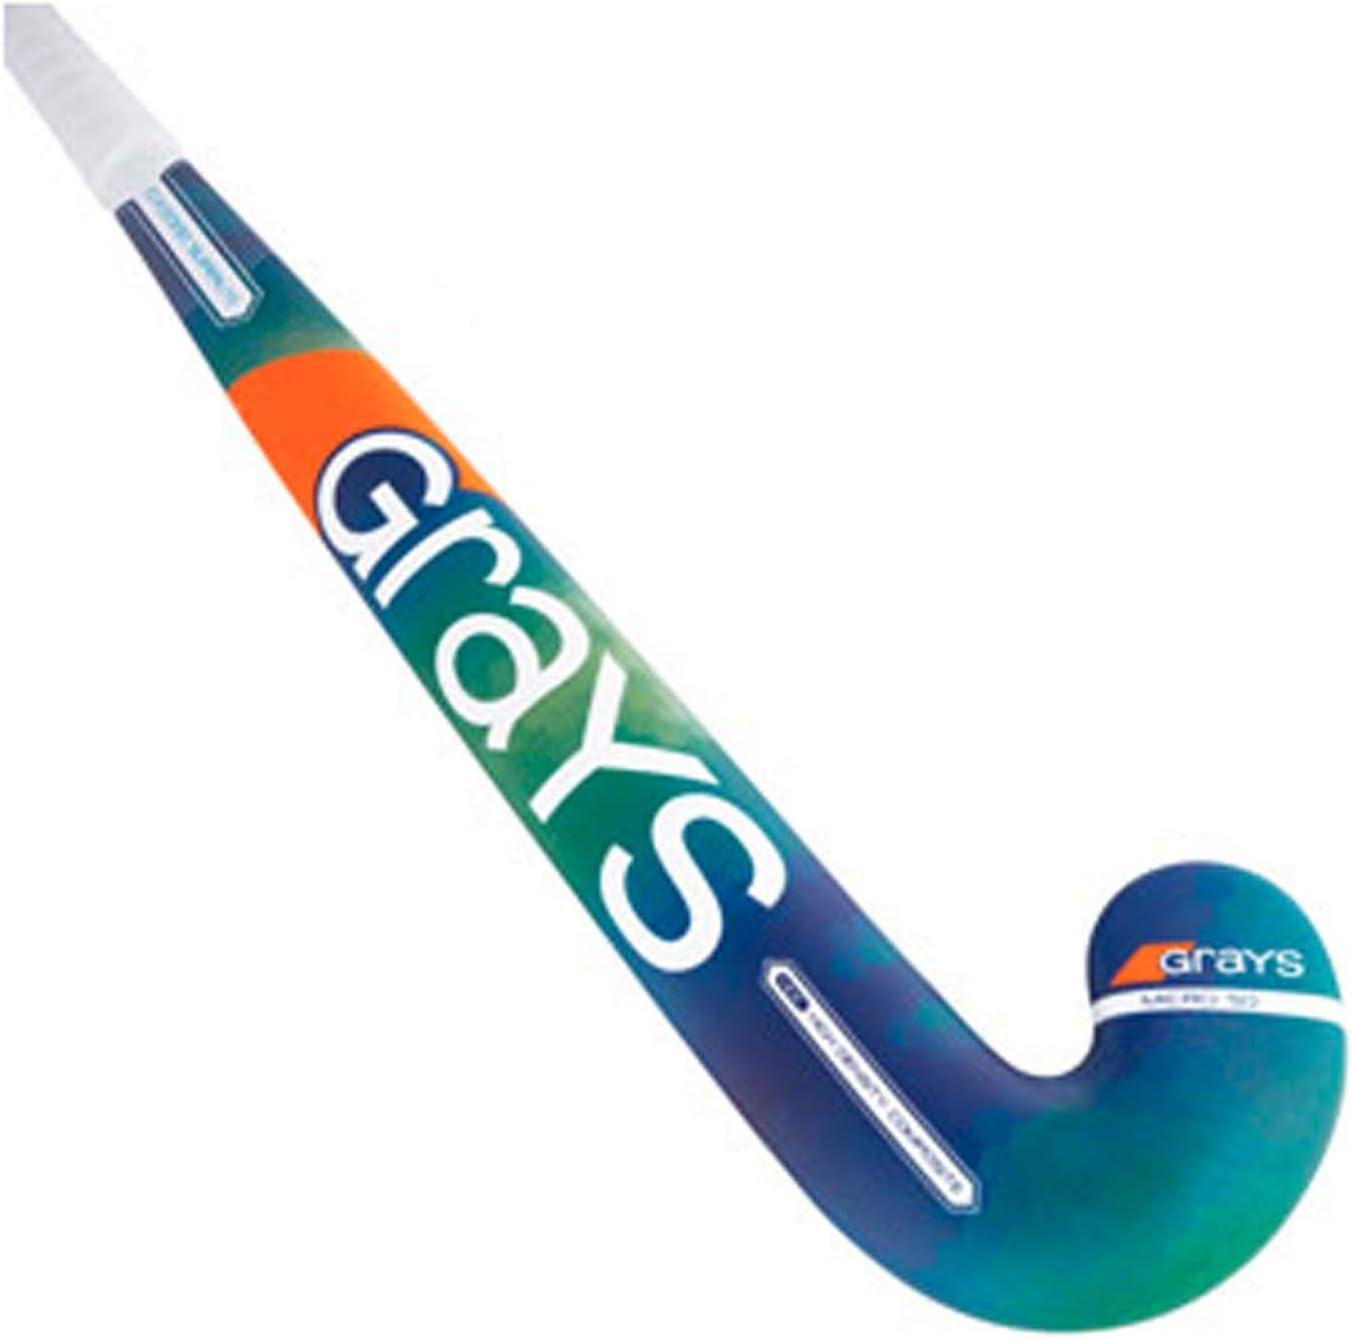 Grays GX2000 Superlight Field Hockey Stick 38 Inches